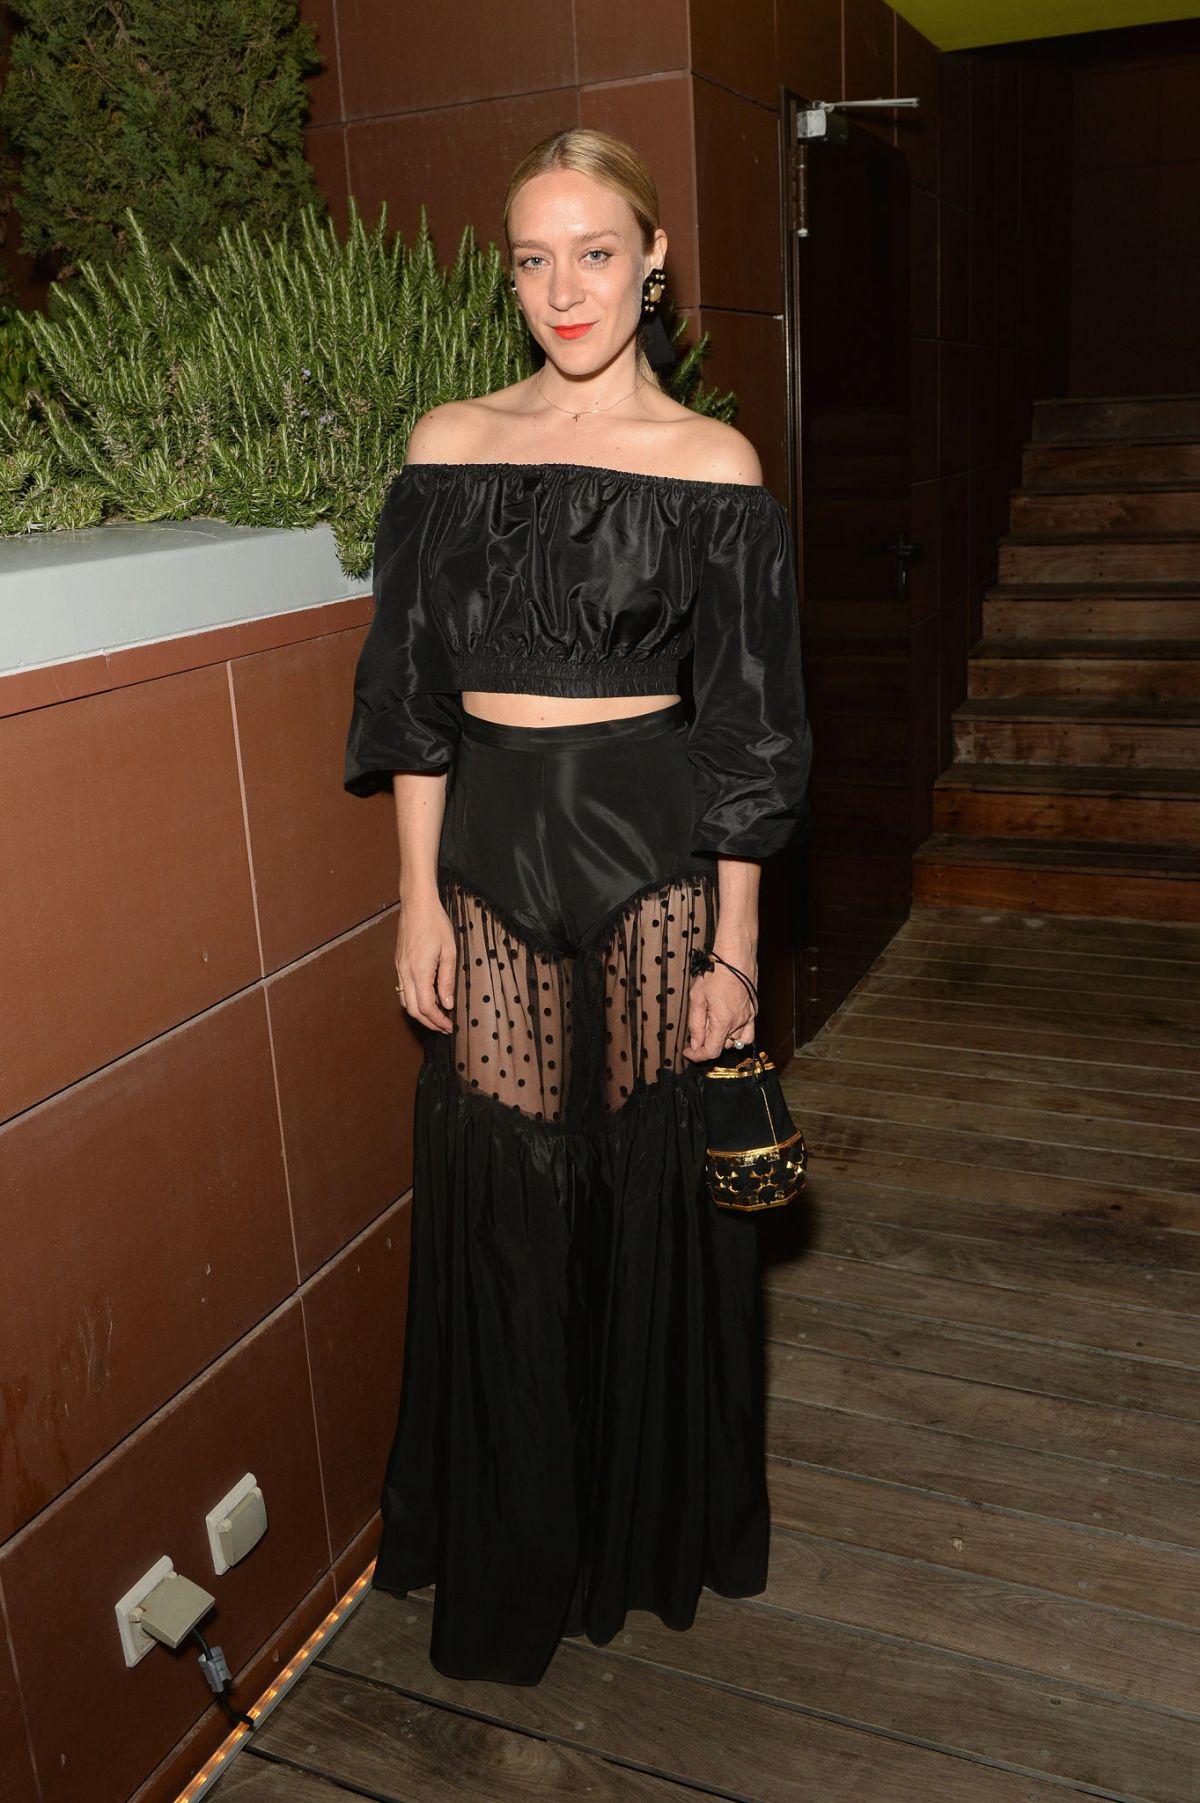 CHLOE SEVIGNY at Amazon Studios at 2016 Cannes Film Festival 05/15/2016